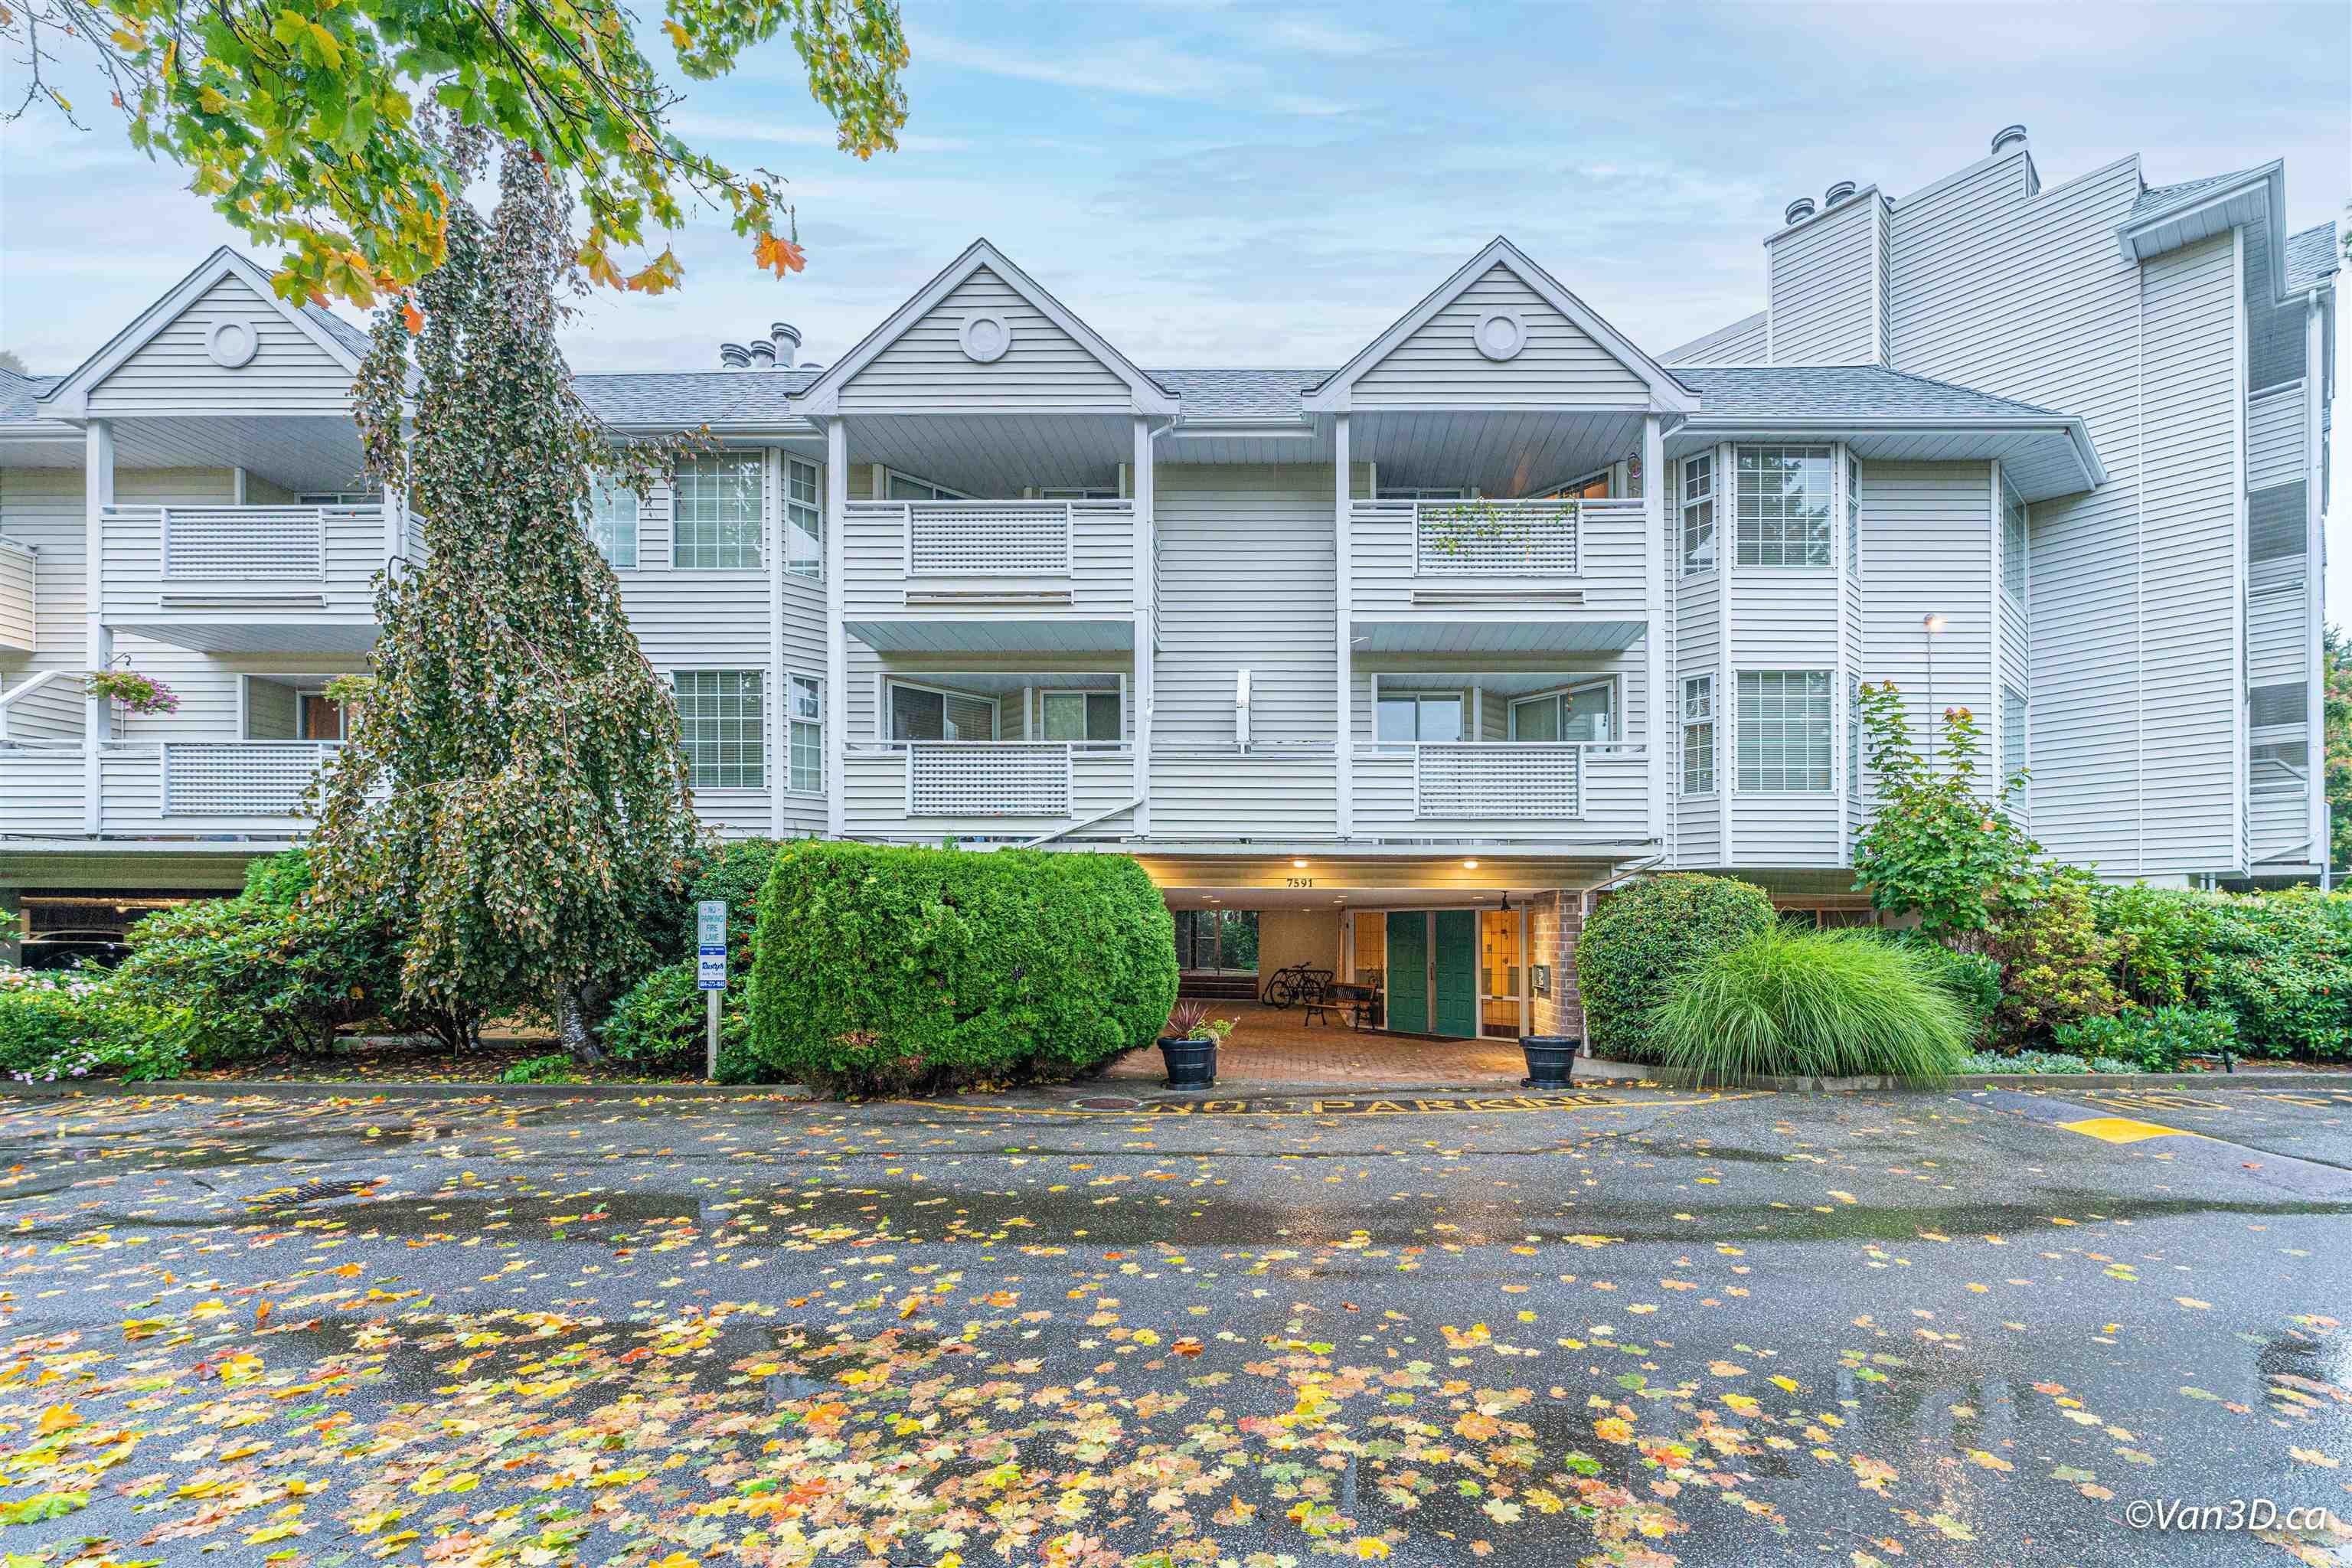 217 7591 MOFFATT ROAD - Brighouse South Apartment/Condo for sale, 1 Bedroom (R2624938)